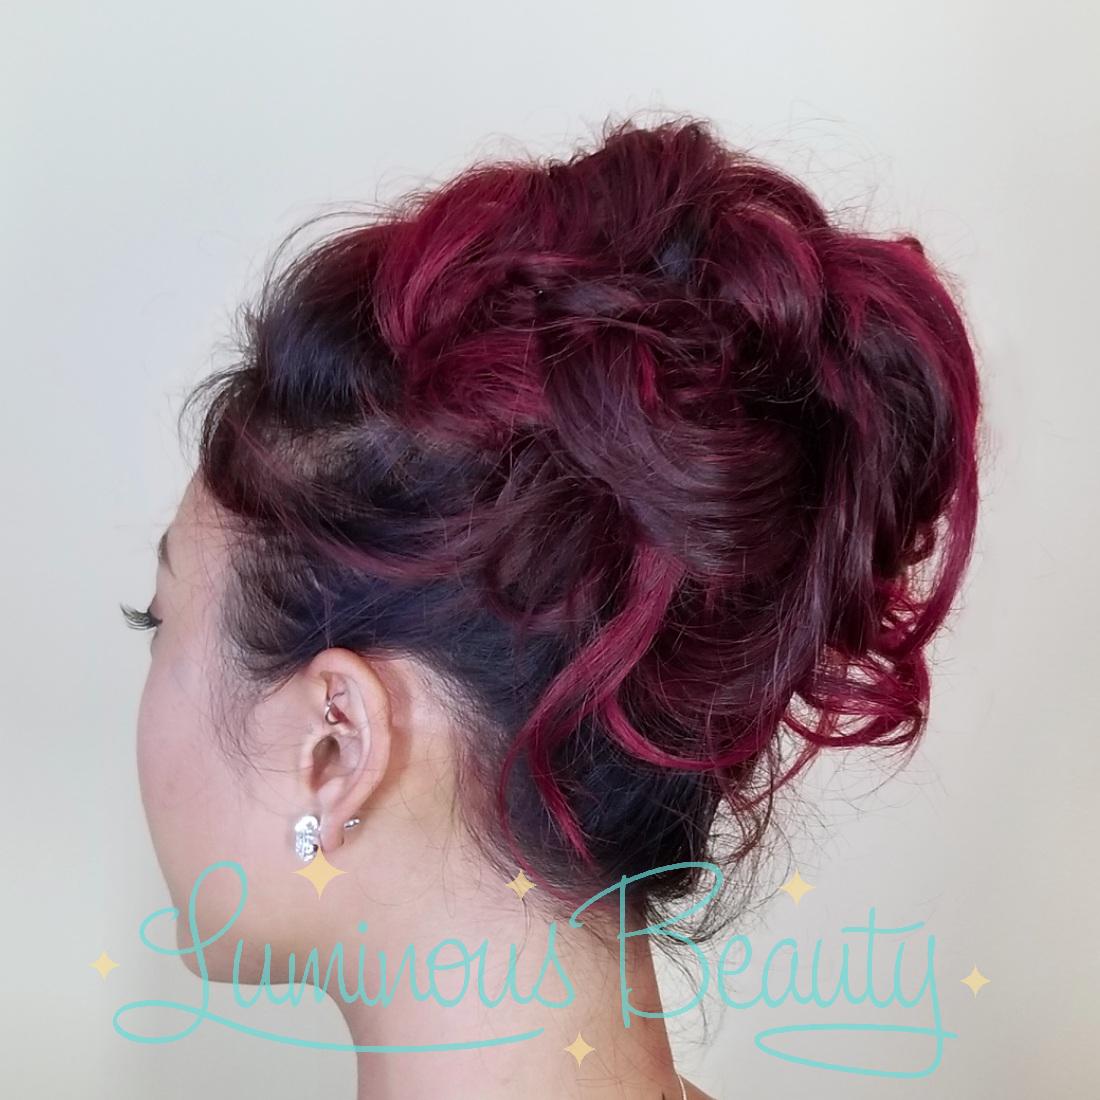 10-05-18  Softly Messy Bridesmaids Hair. Minneapolis Wedding Stylist. Luminous Beauty Stylist. Best of The Knot Weddings Stylist..png